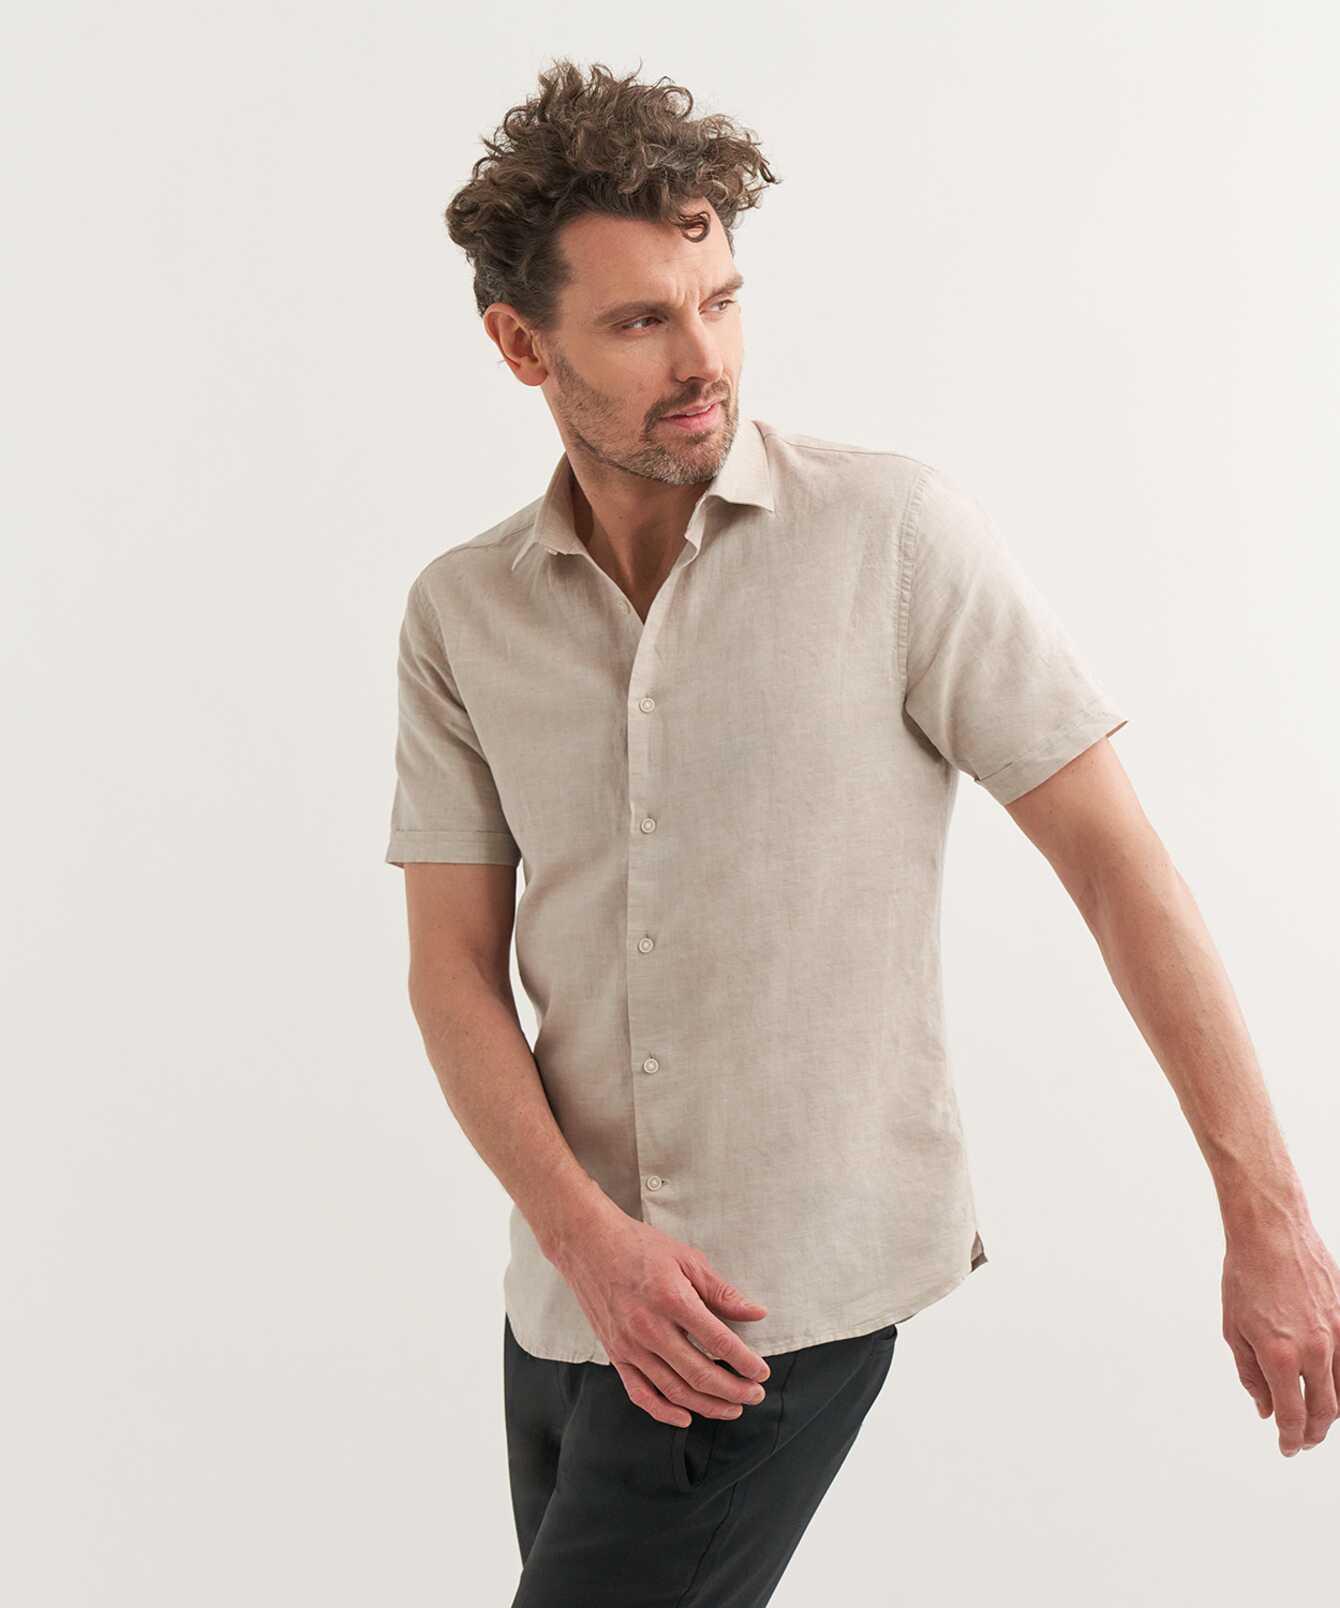 Skjorta Portofino Linne Kortärmad Beige The Shirt Factory